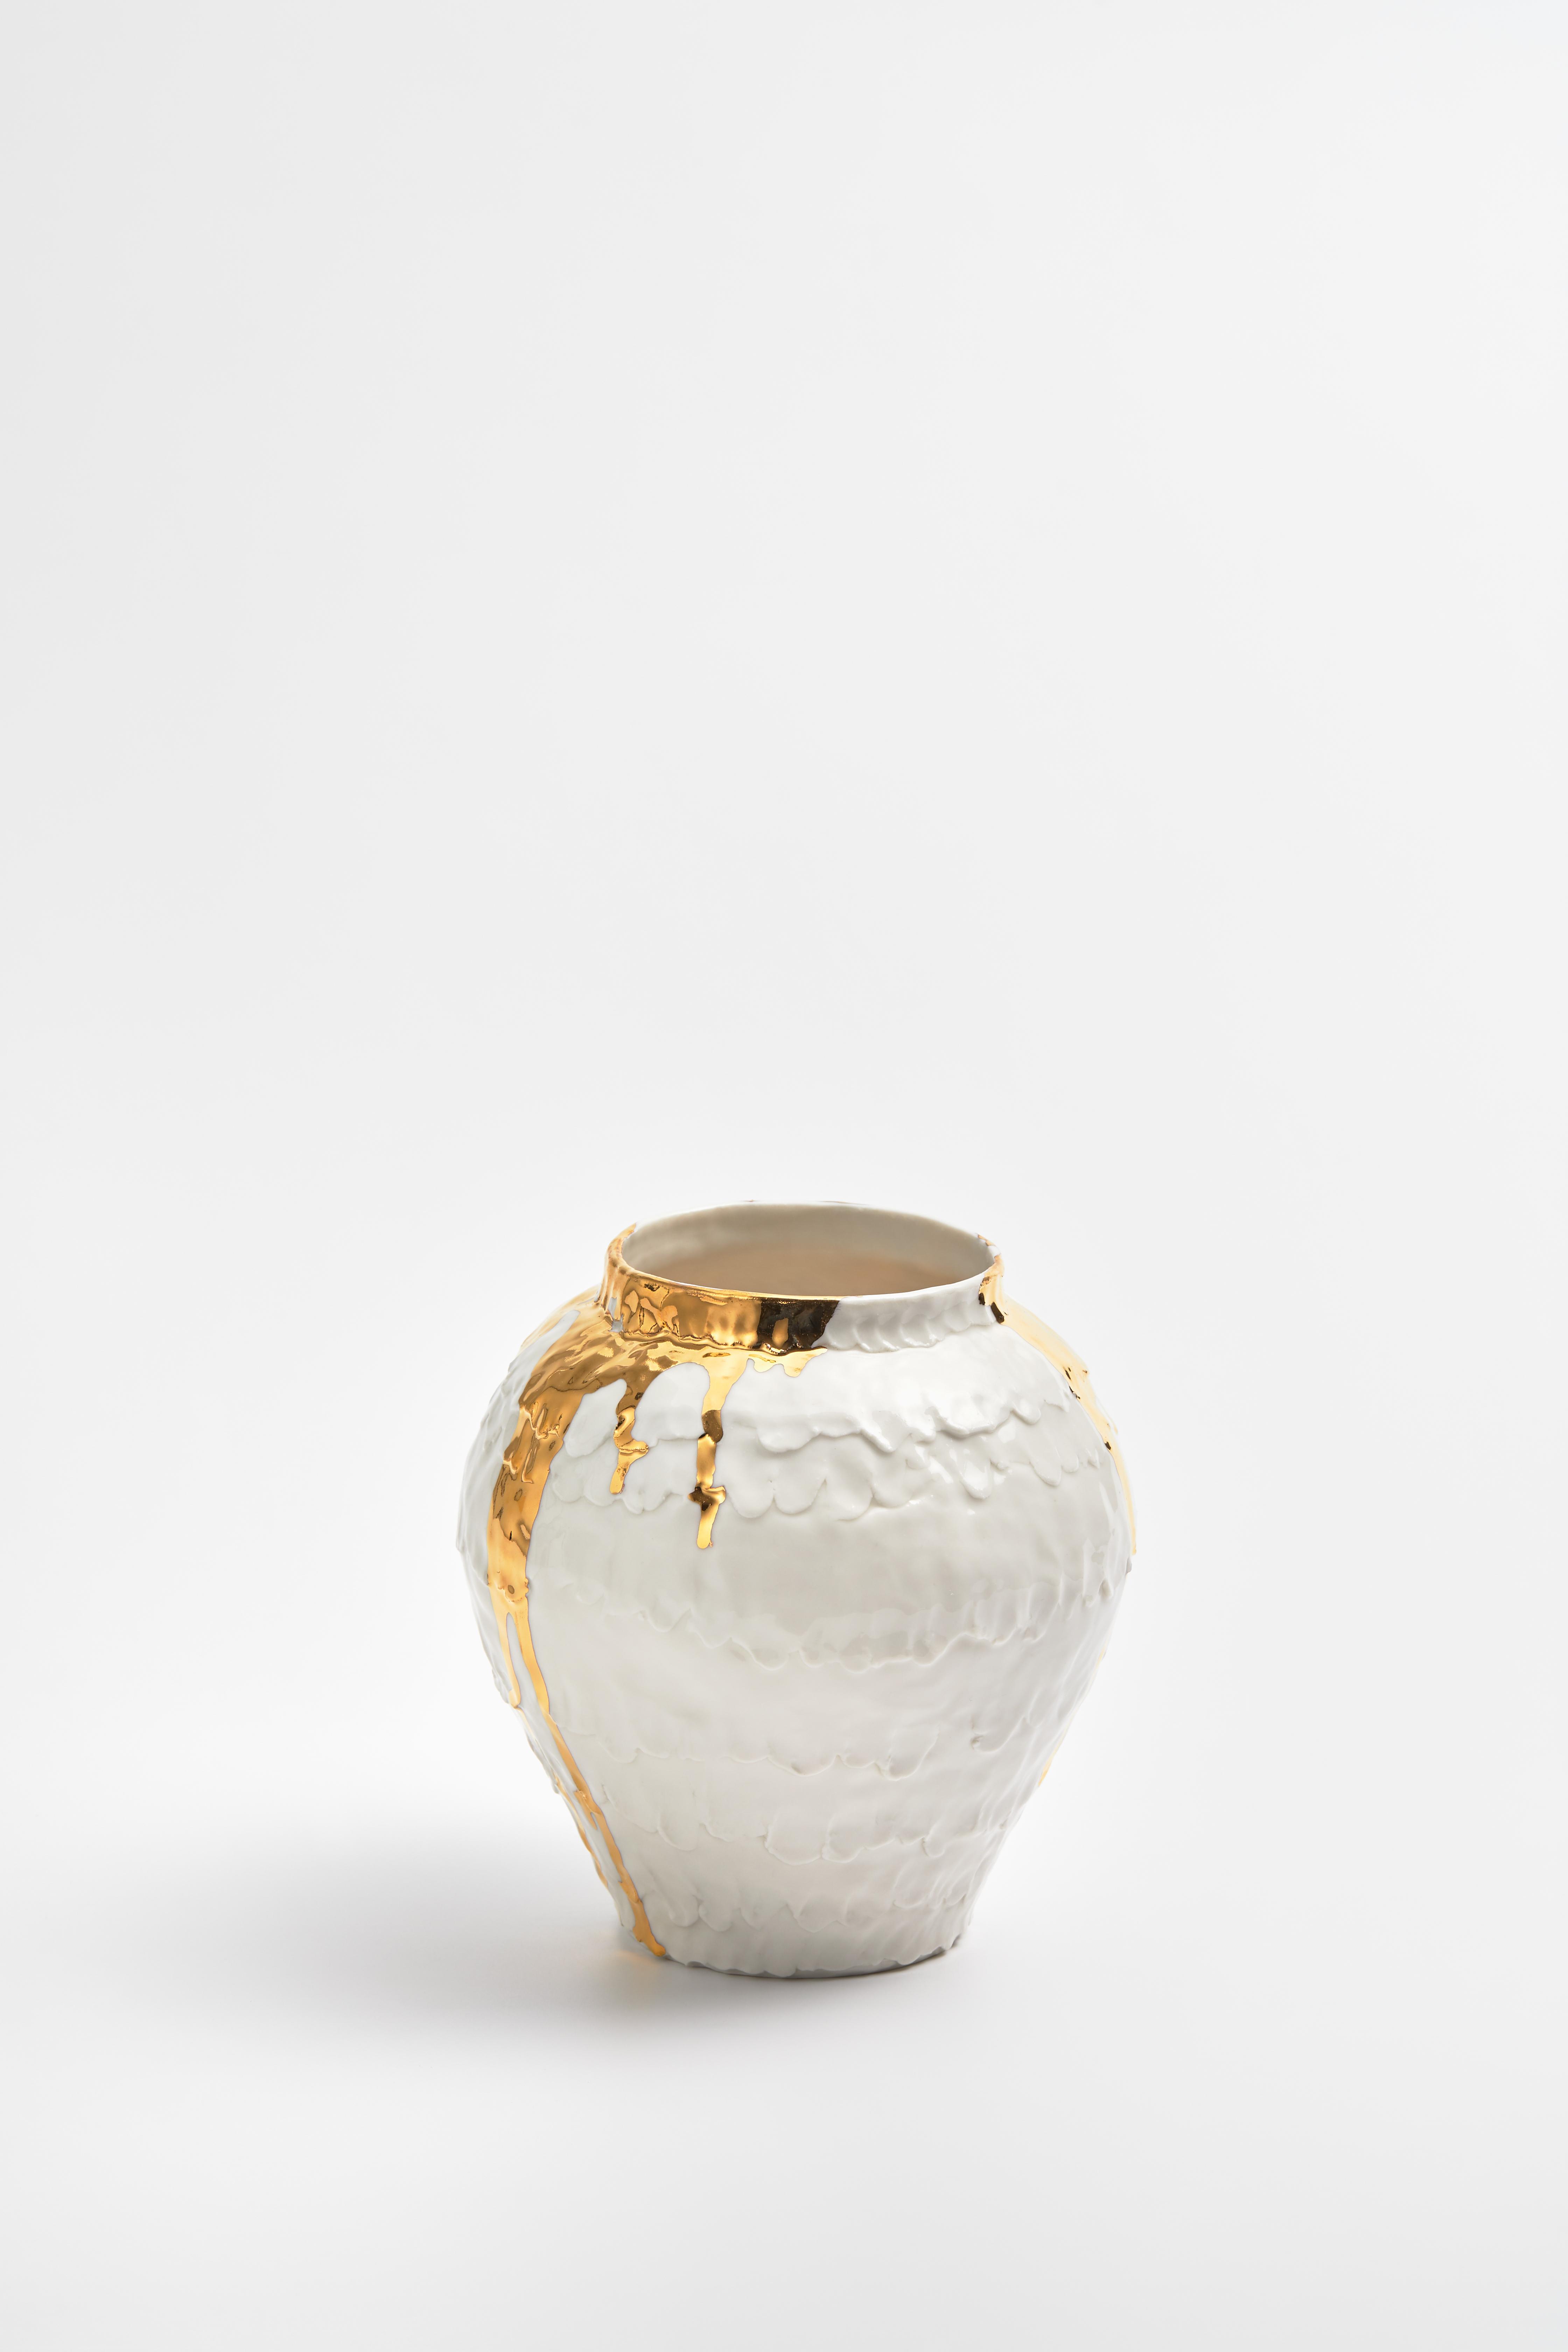 Life-size jar